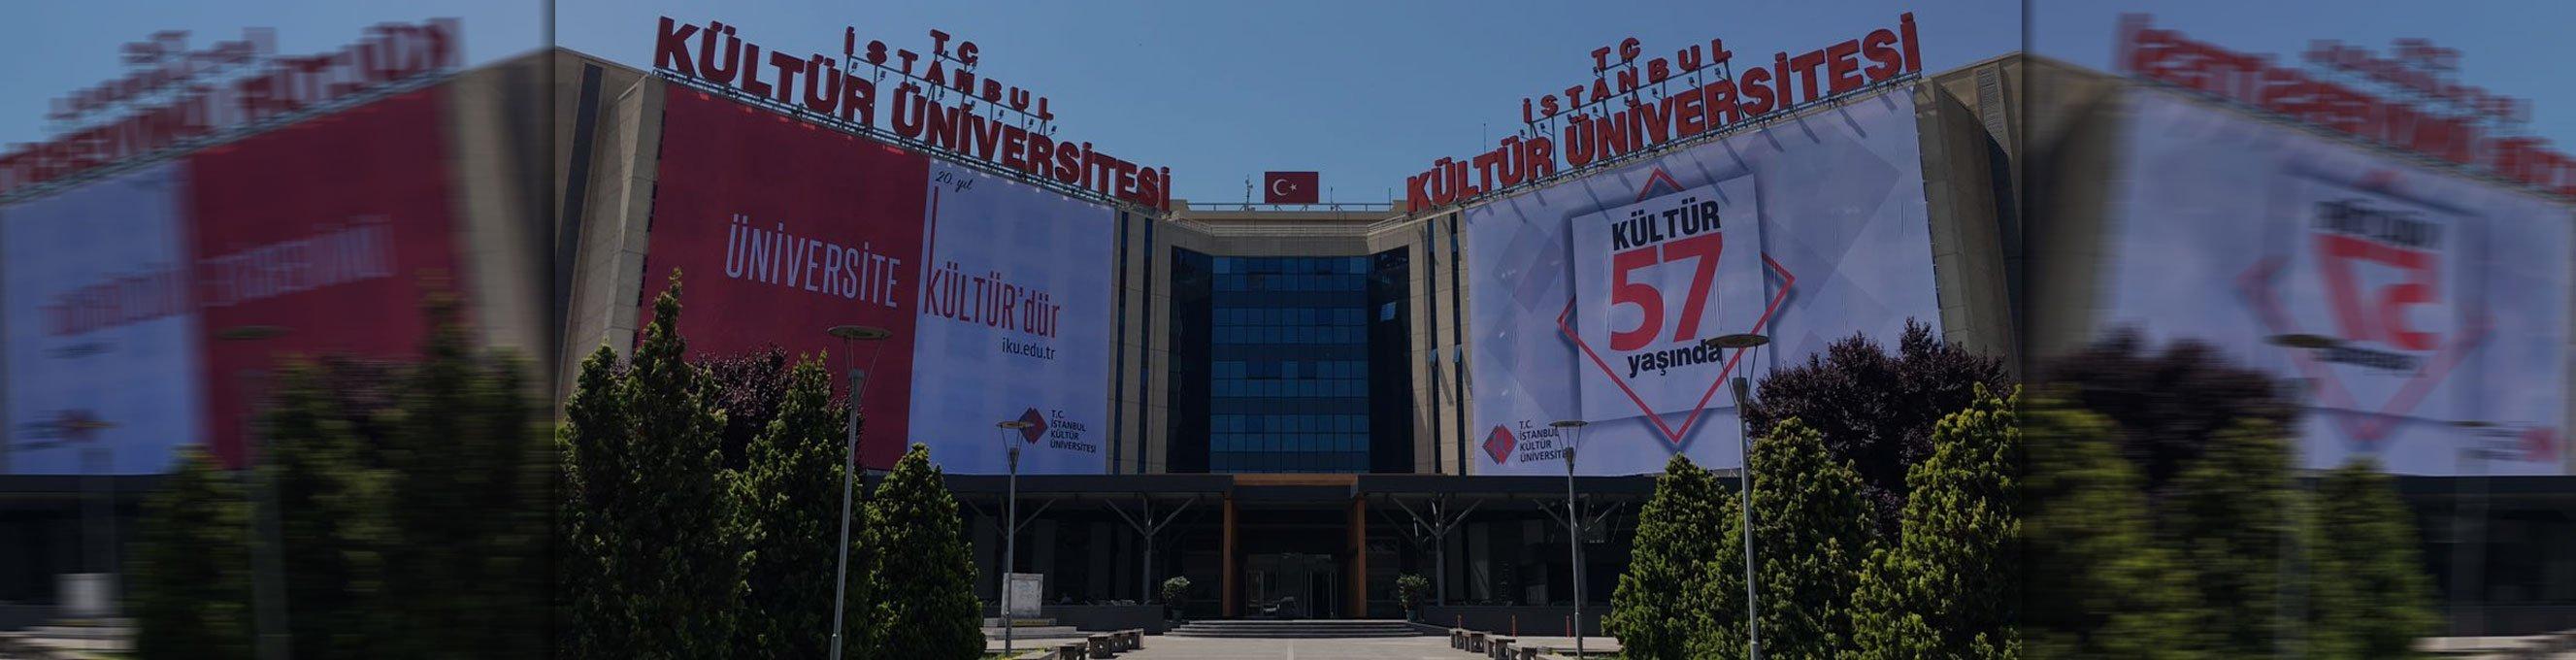 Dahi Ders Evi Beylikdüzü / İstanbul